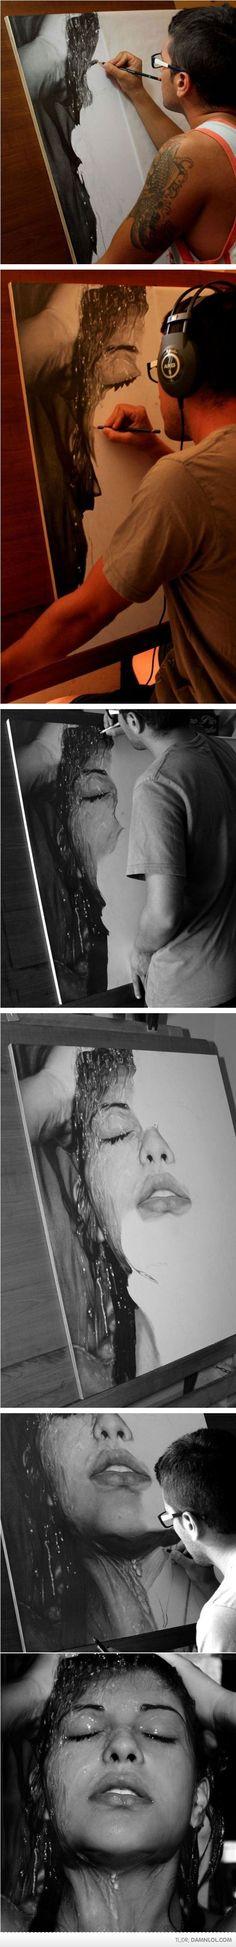 Realistic Drawing Design Photo-realistic art By Diego Fazio. Realistic Paintings, Realistic Drawings, Cool Paintings, Cool Artwork, Amazing Drawings, Cool Drawings, Amazing Art, Portraits, Drawing People